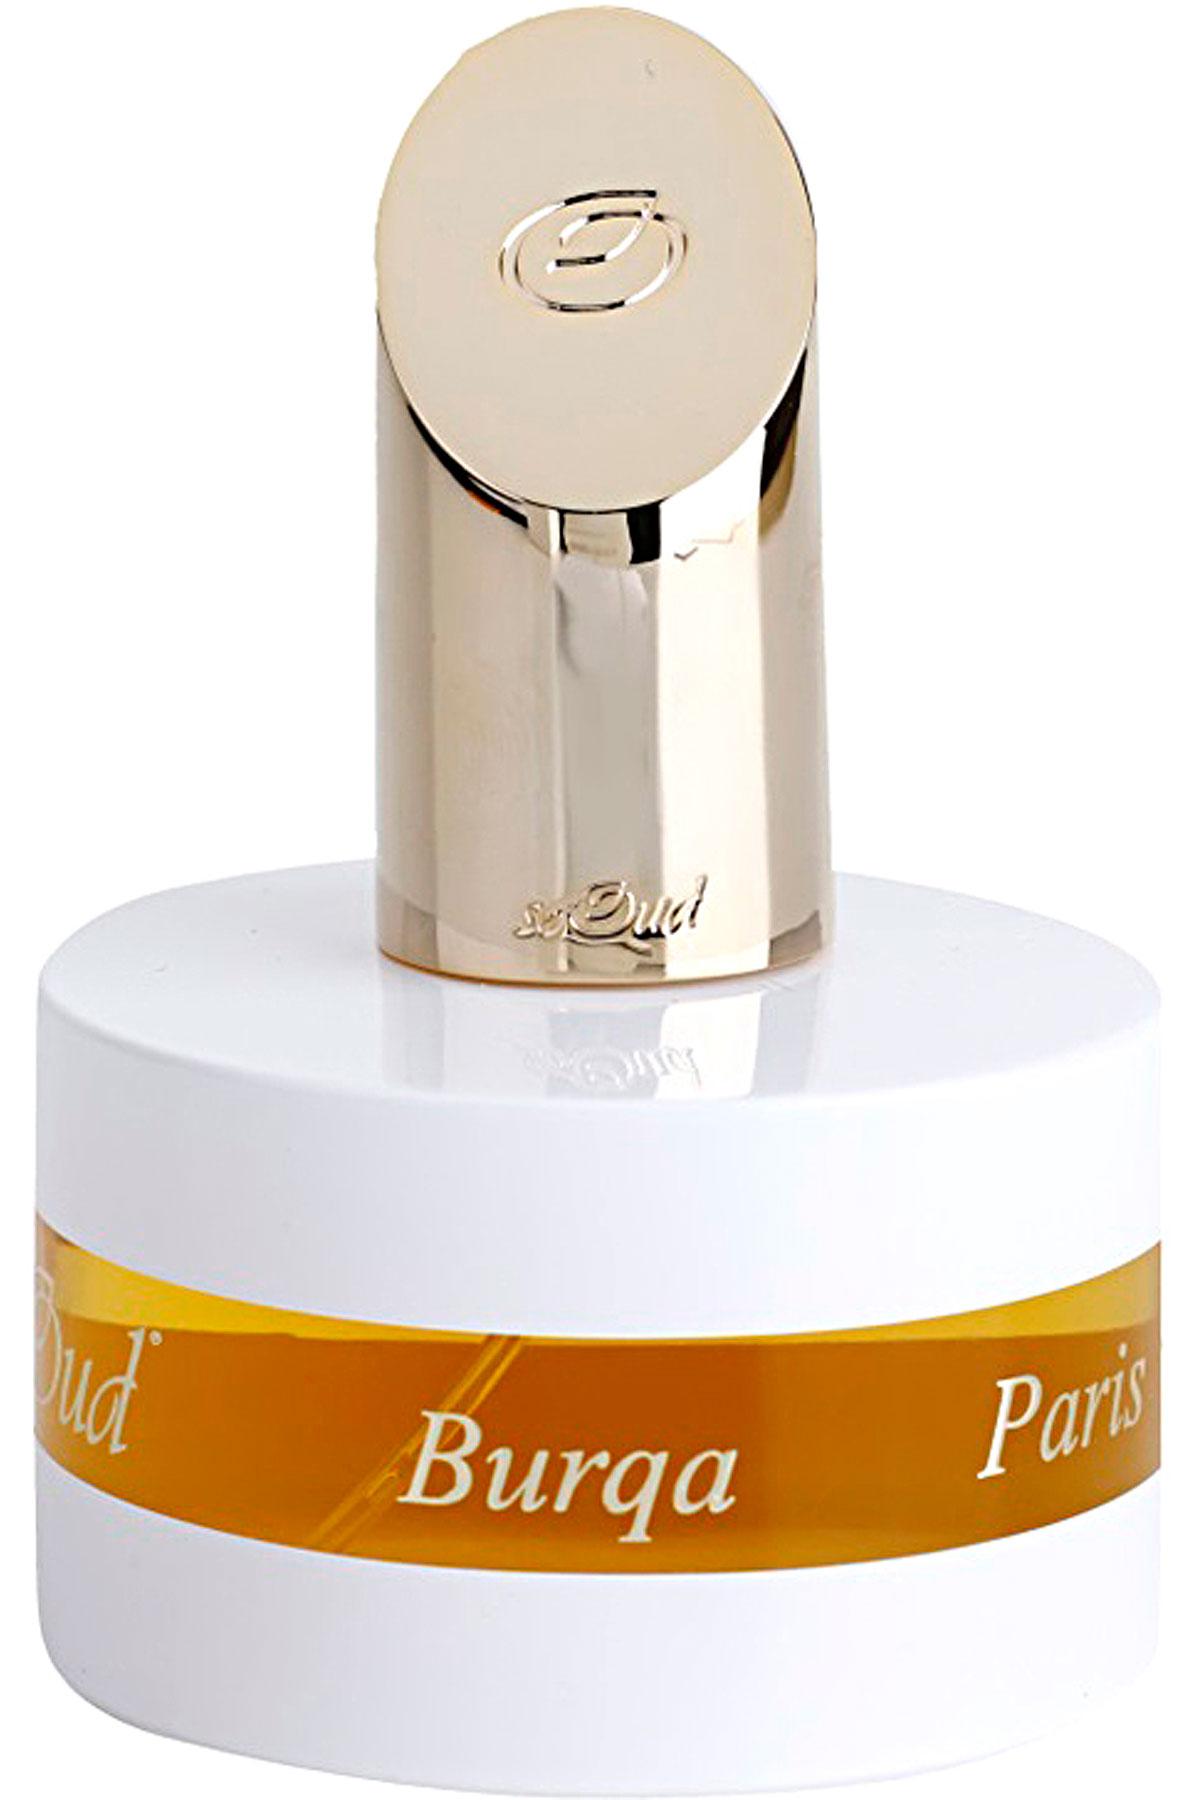 SoOud Fragrances for Men, Burqa - Eau Fine - 60 Ml, 2019, 60 ml